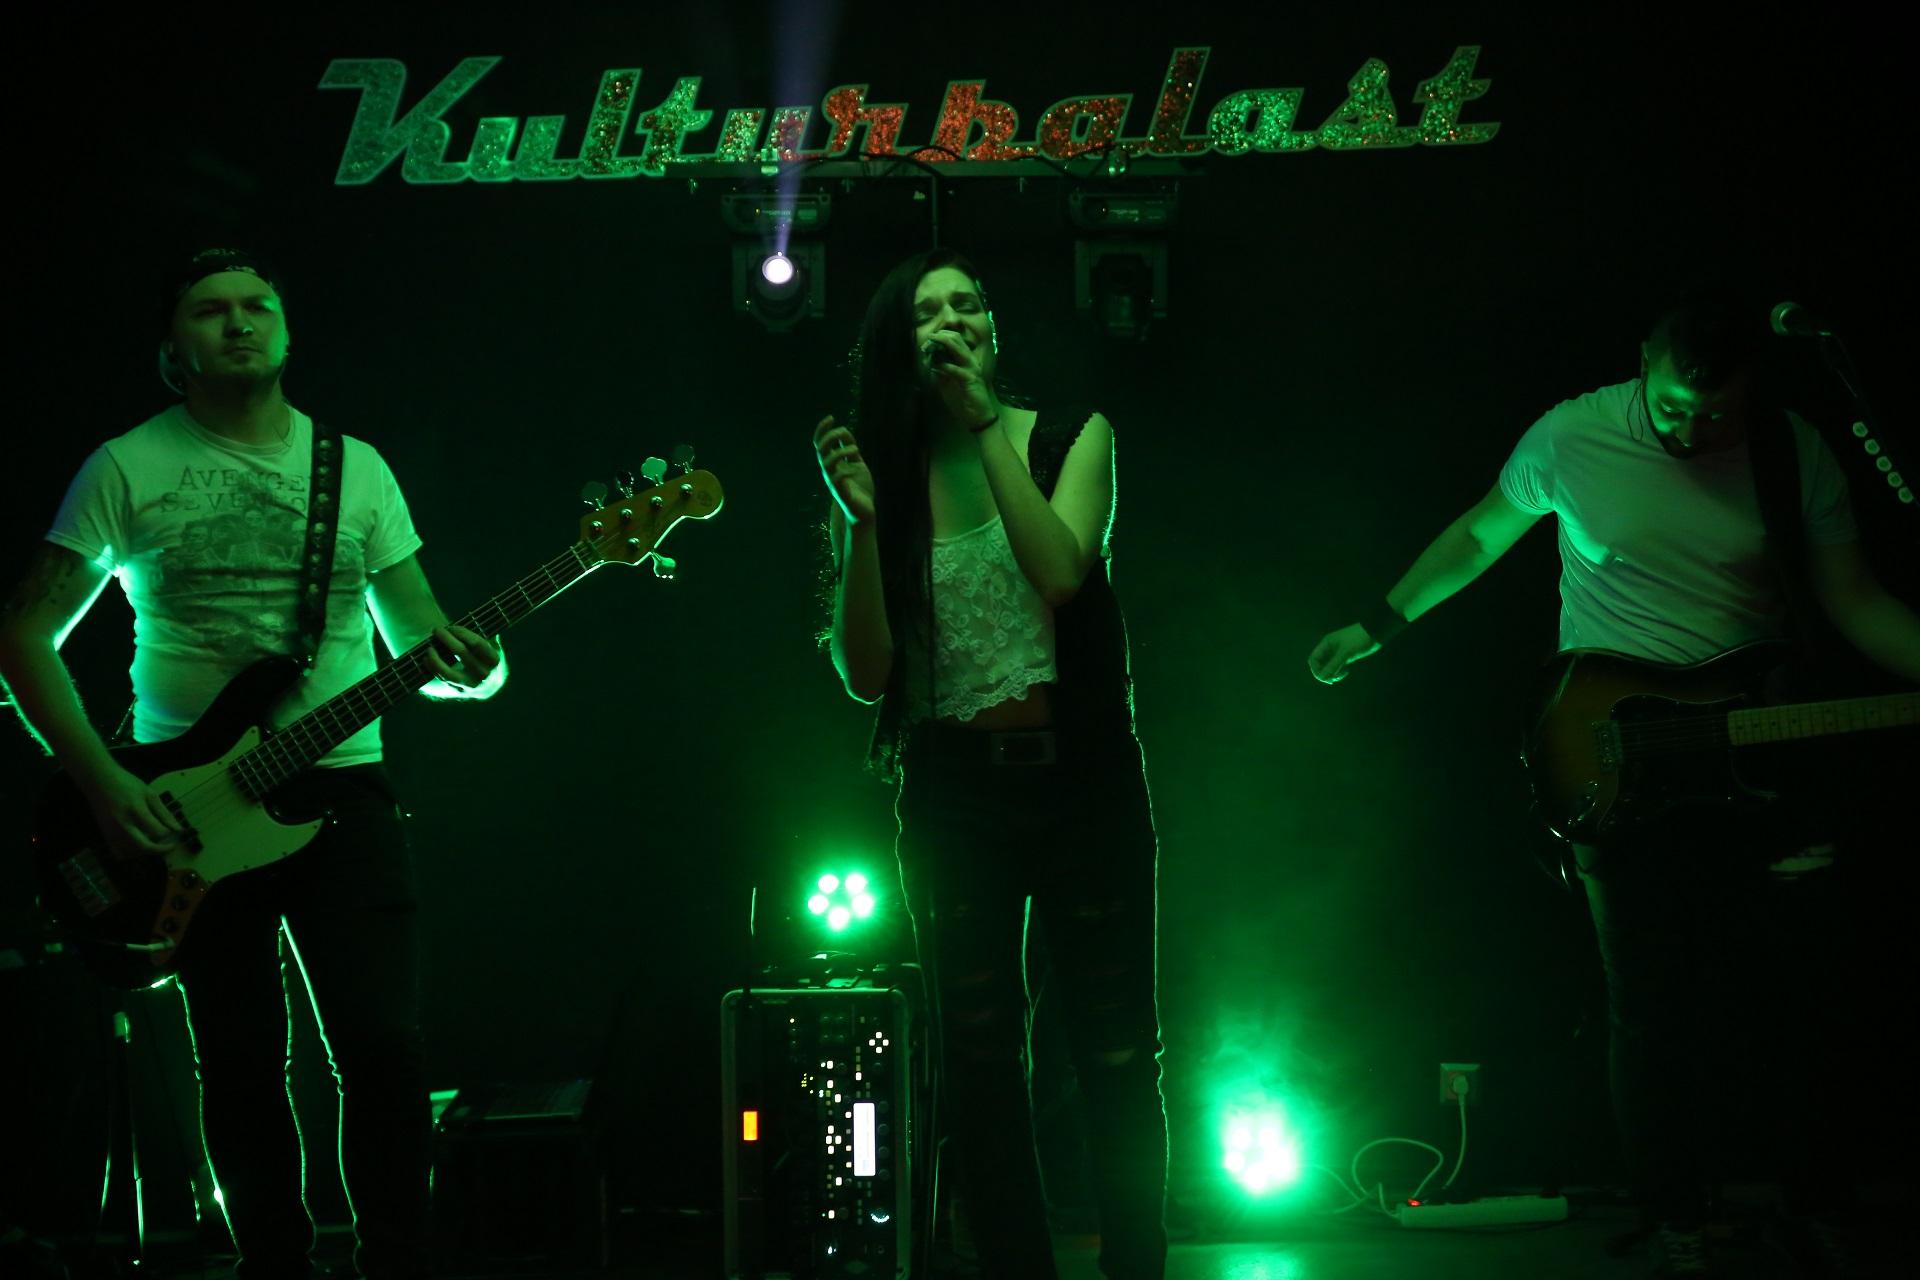 Menschenkind_Live_Kulturpalast-2